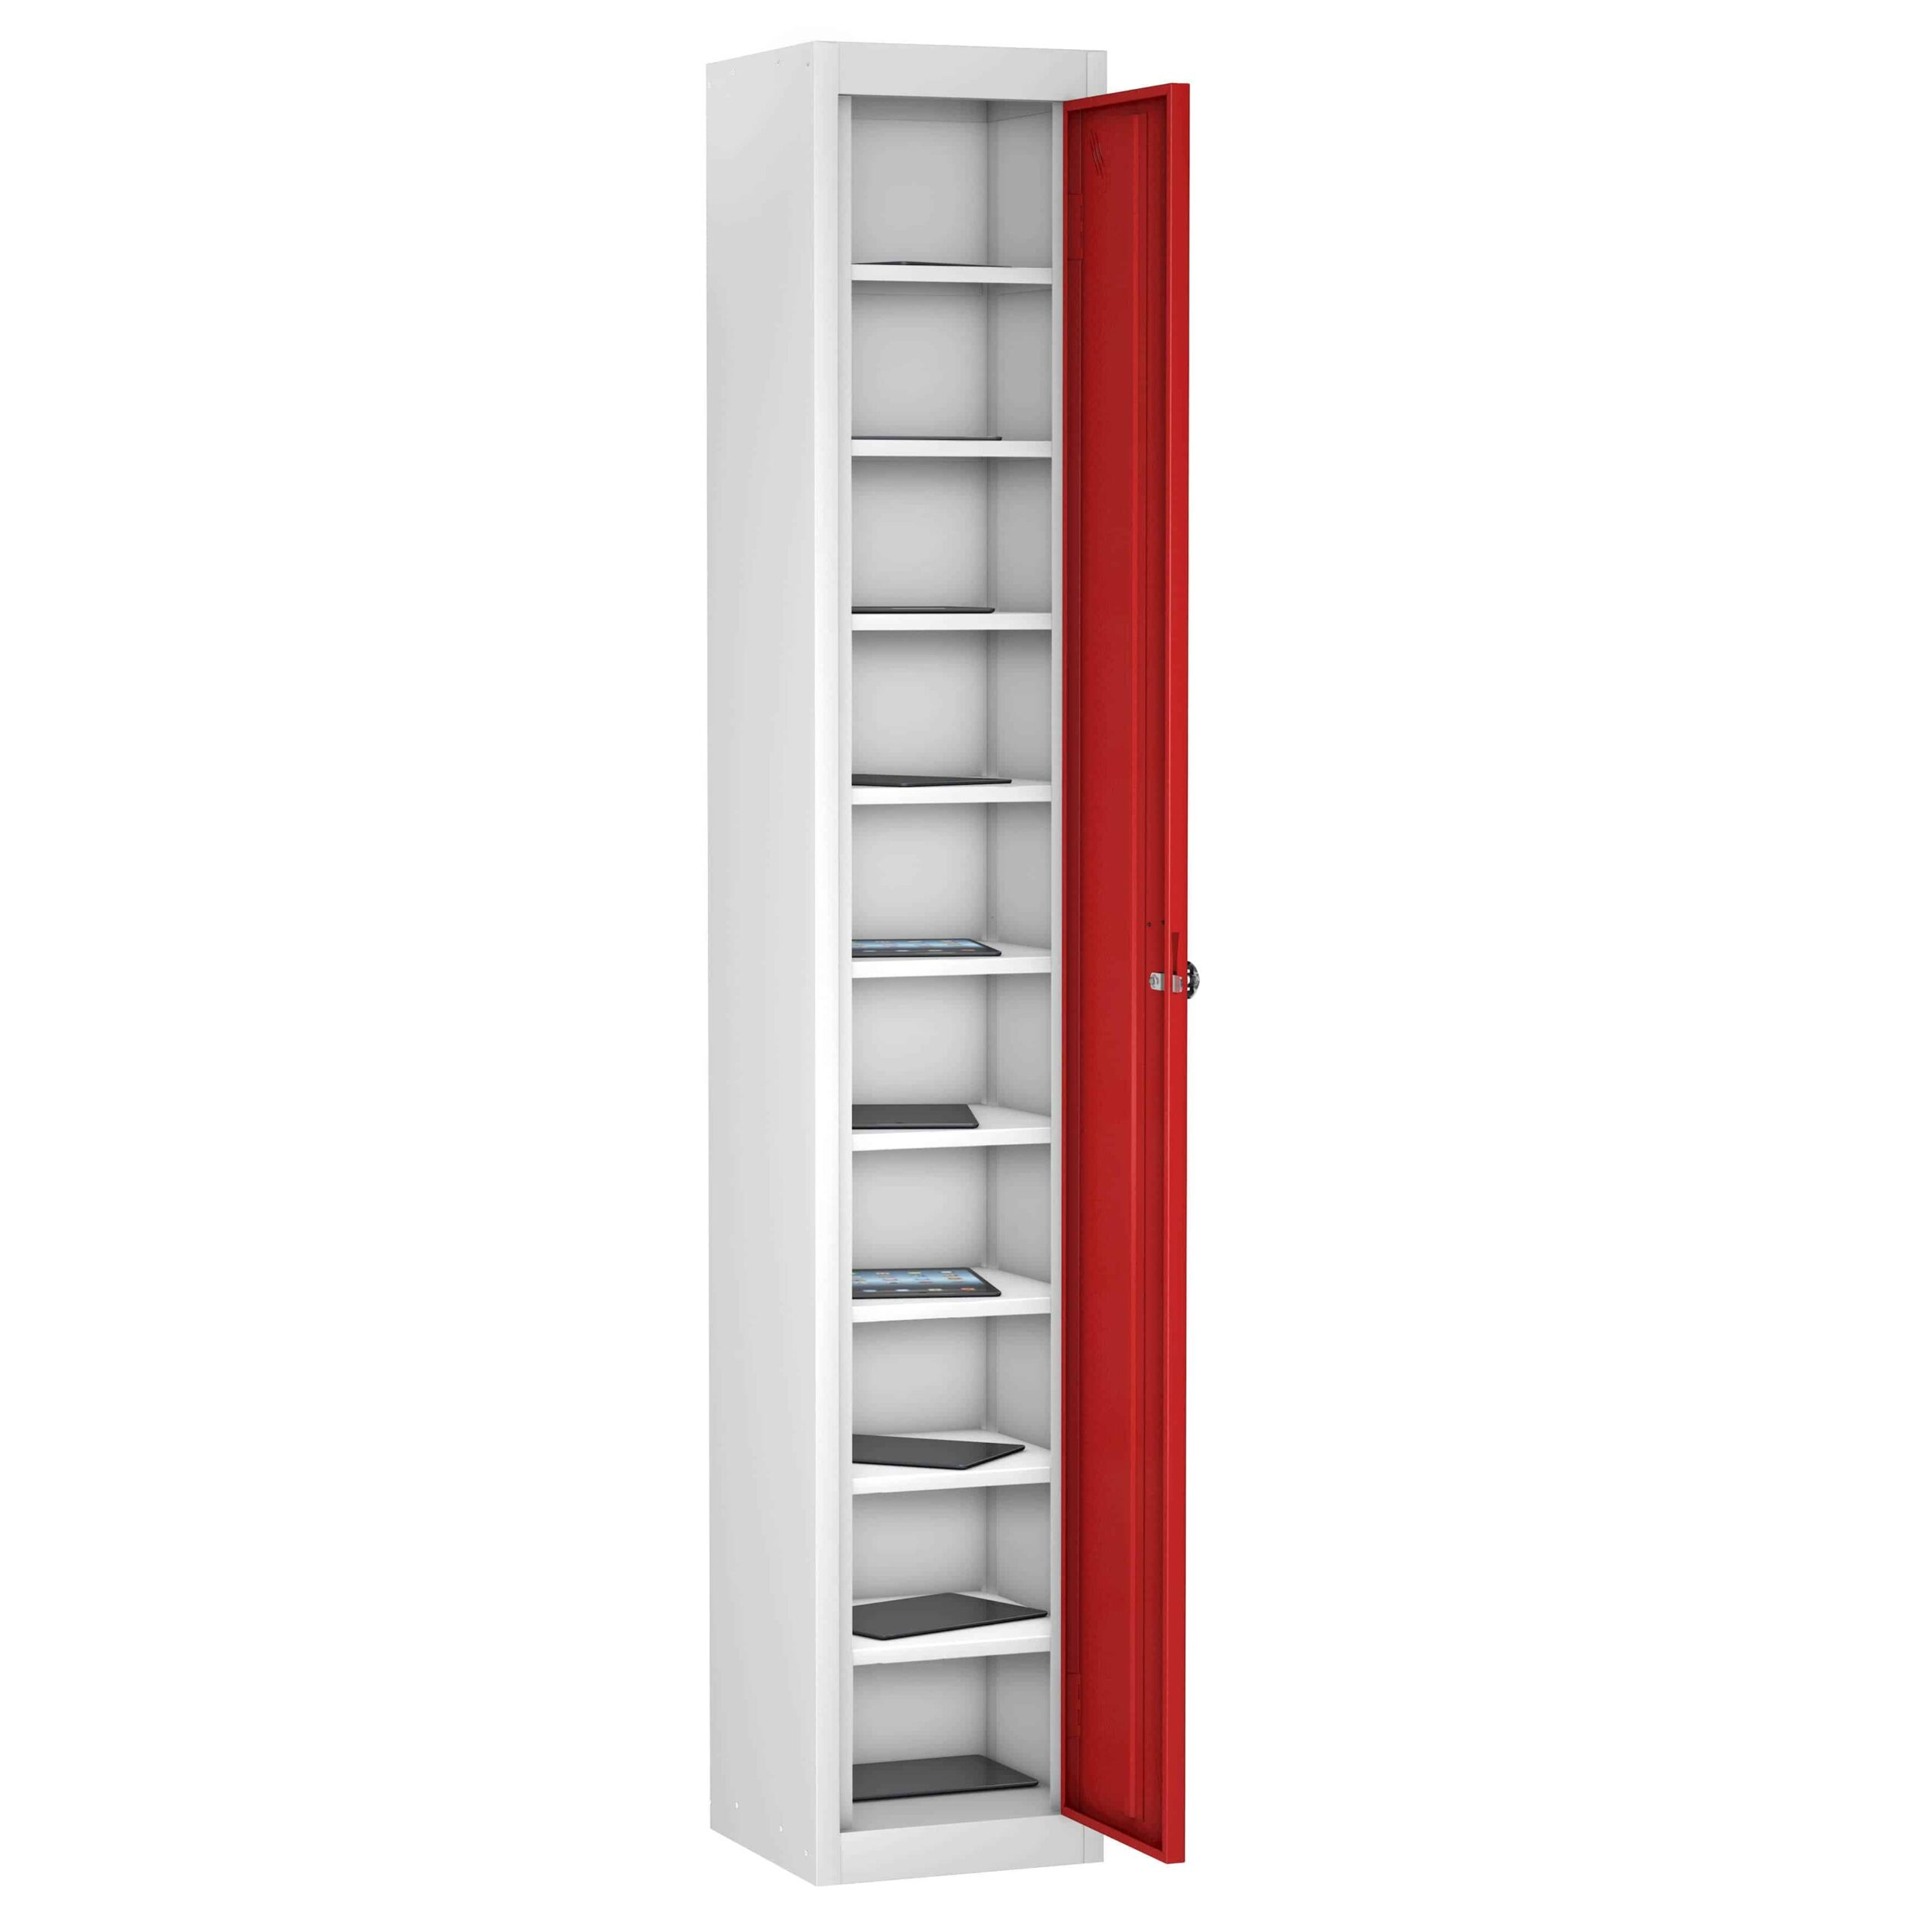 TABbox 10 Shelf Storage Lockers